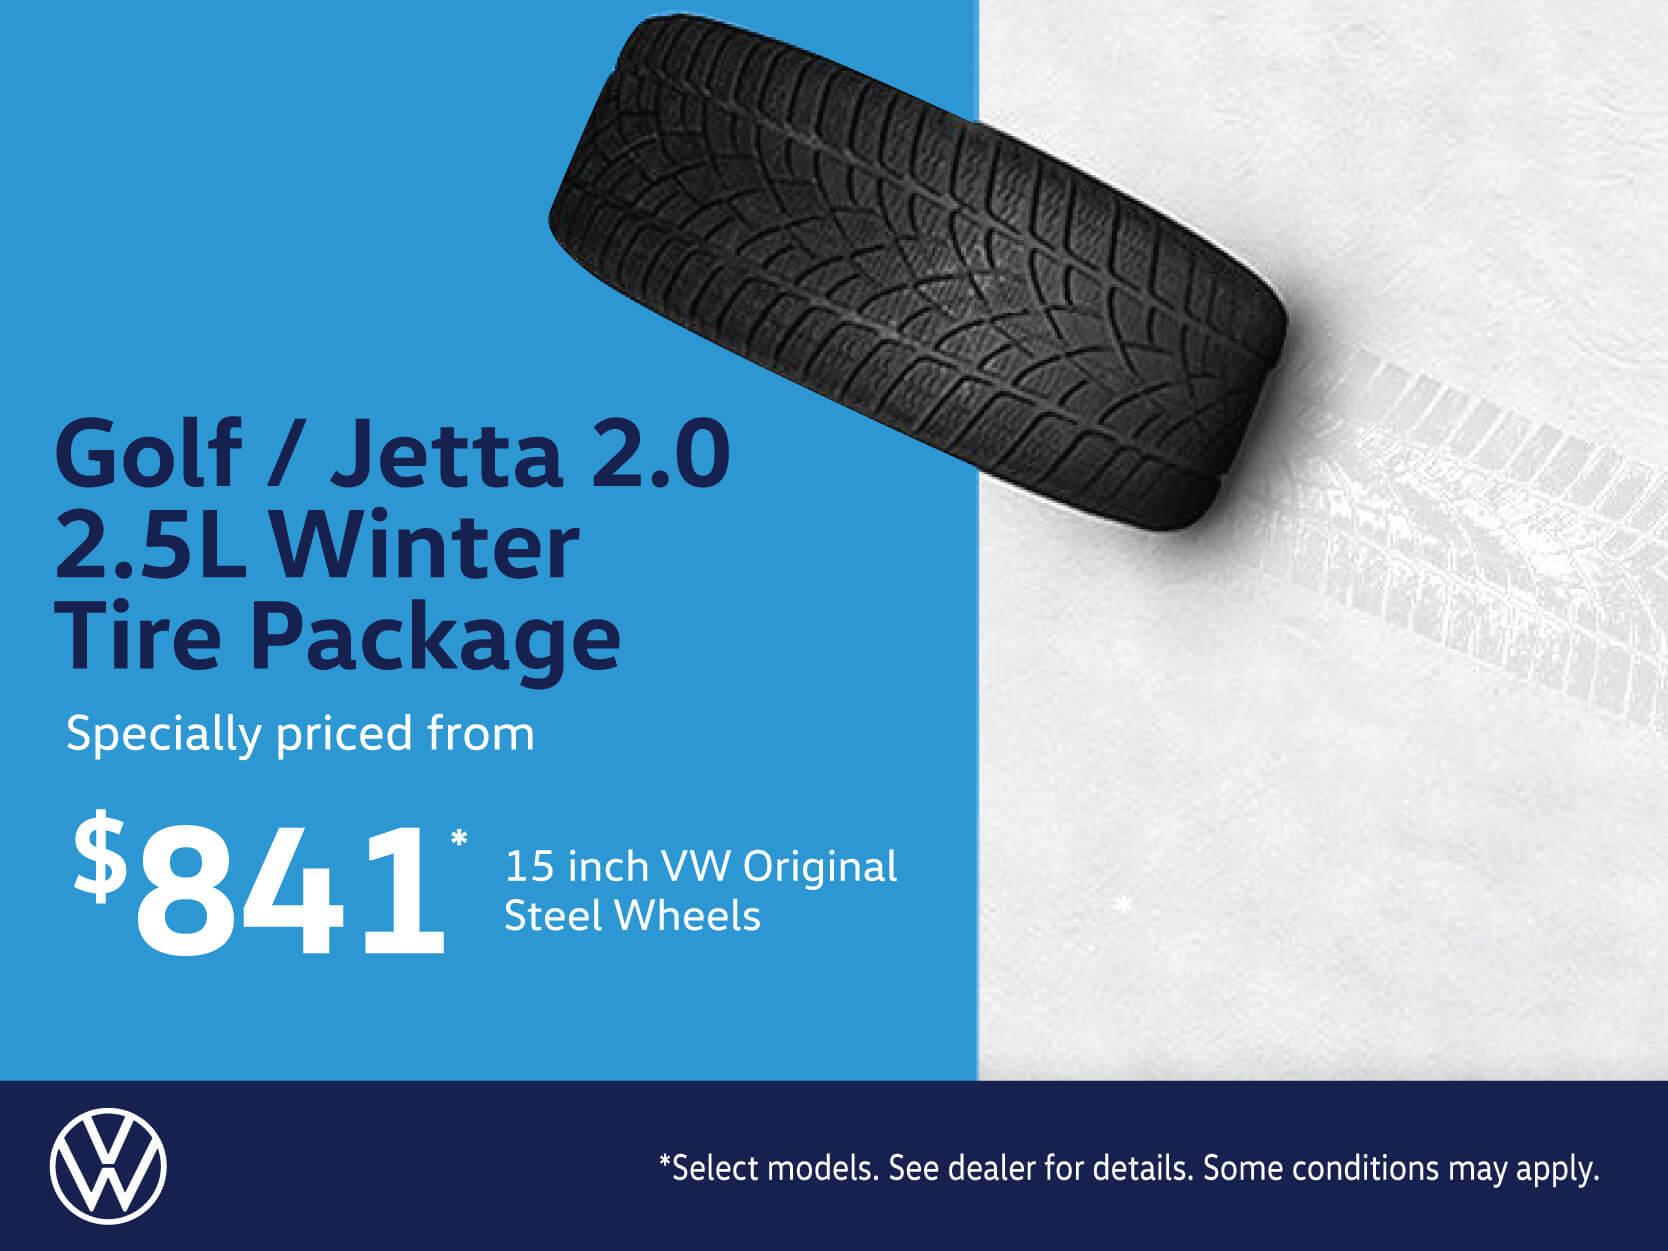 Golf-Jetta 2.0-2.5L Winter Tire Package